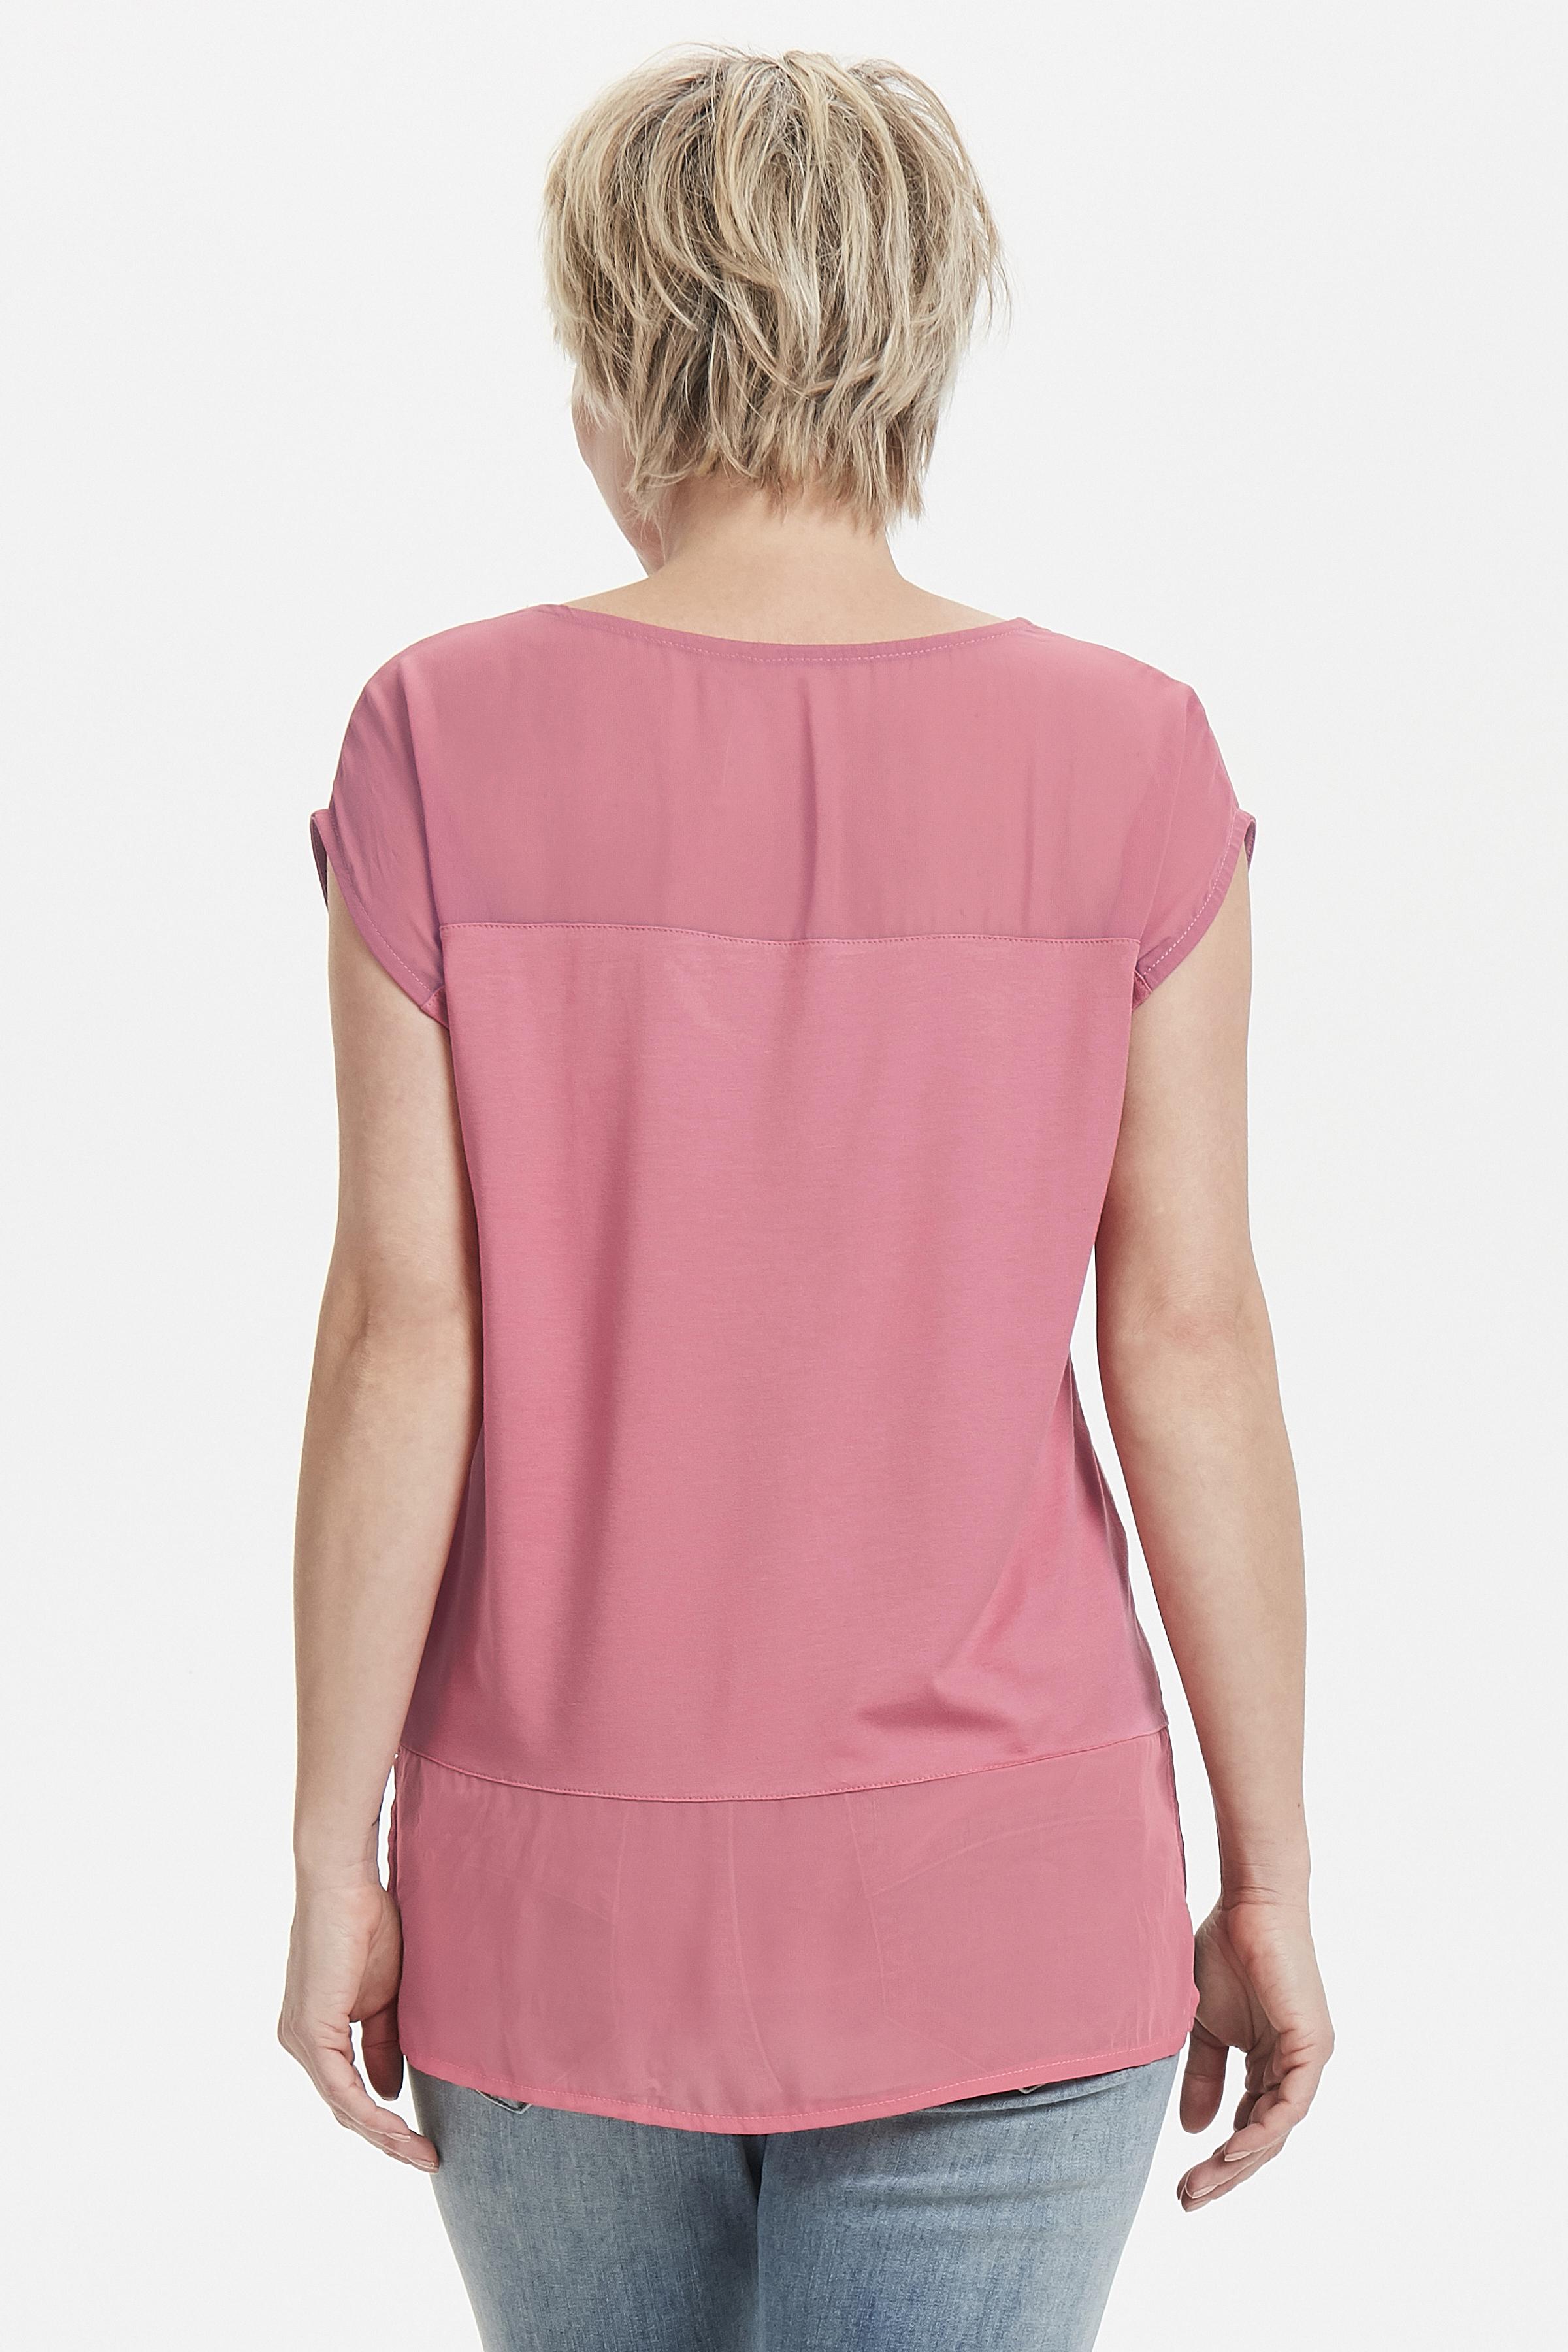 Mørk rosa Kortærmet T-shirt fra Bon'A Parte – Køb Mørk rosa Kortærmet T-shirt fra str. S-2XL her